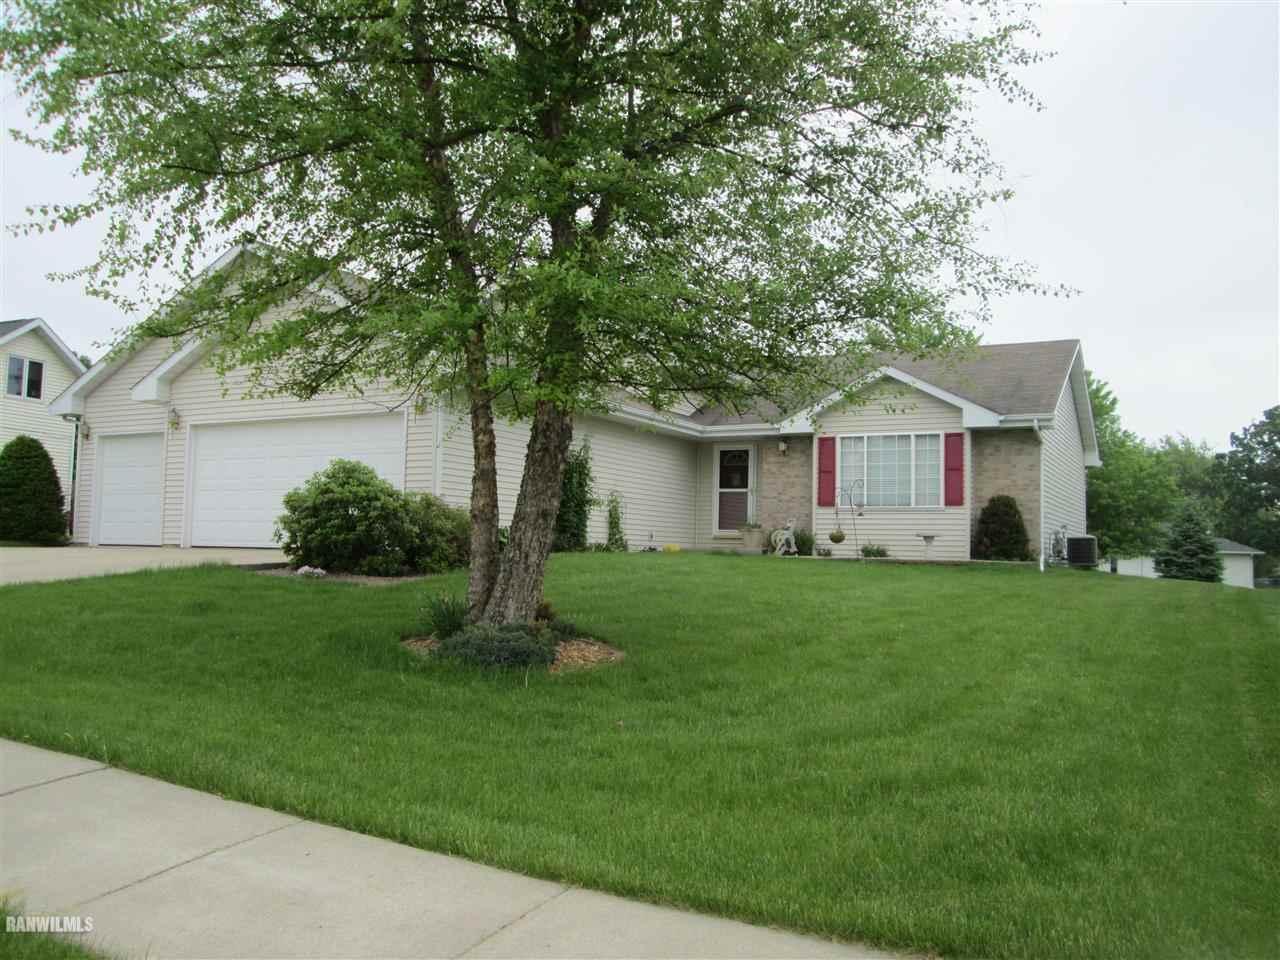 Real Estate for Sale, ListingId: 28389641, Freeport,IL61032